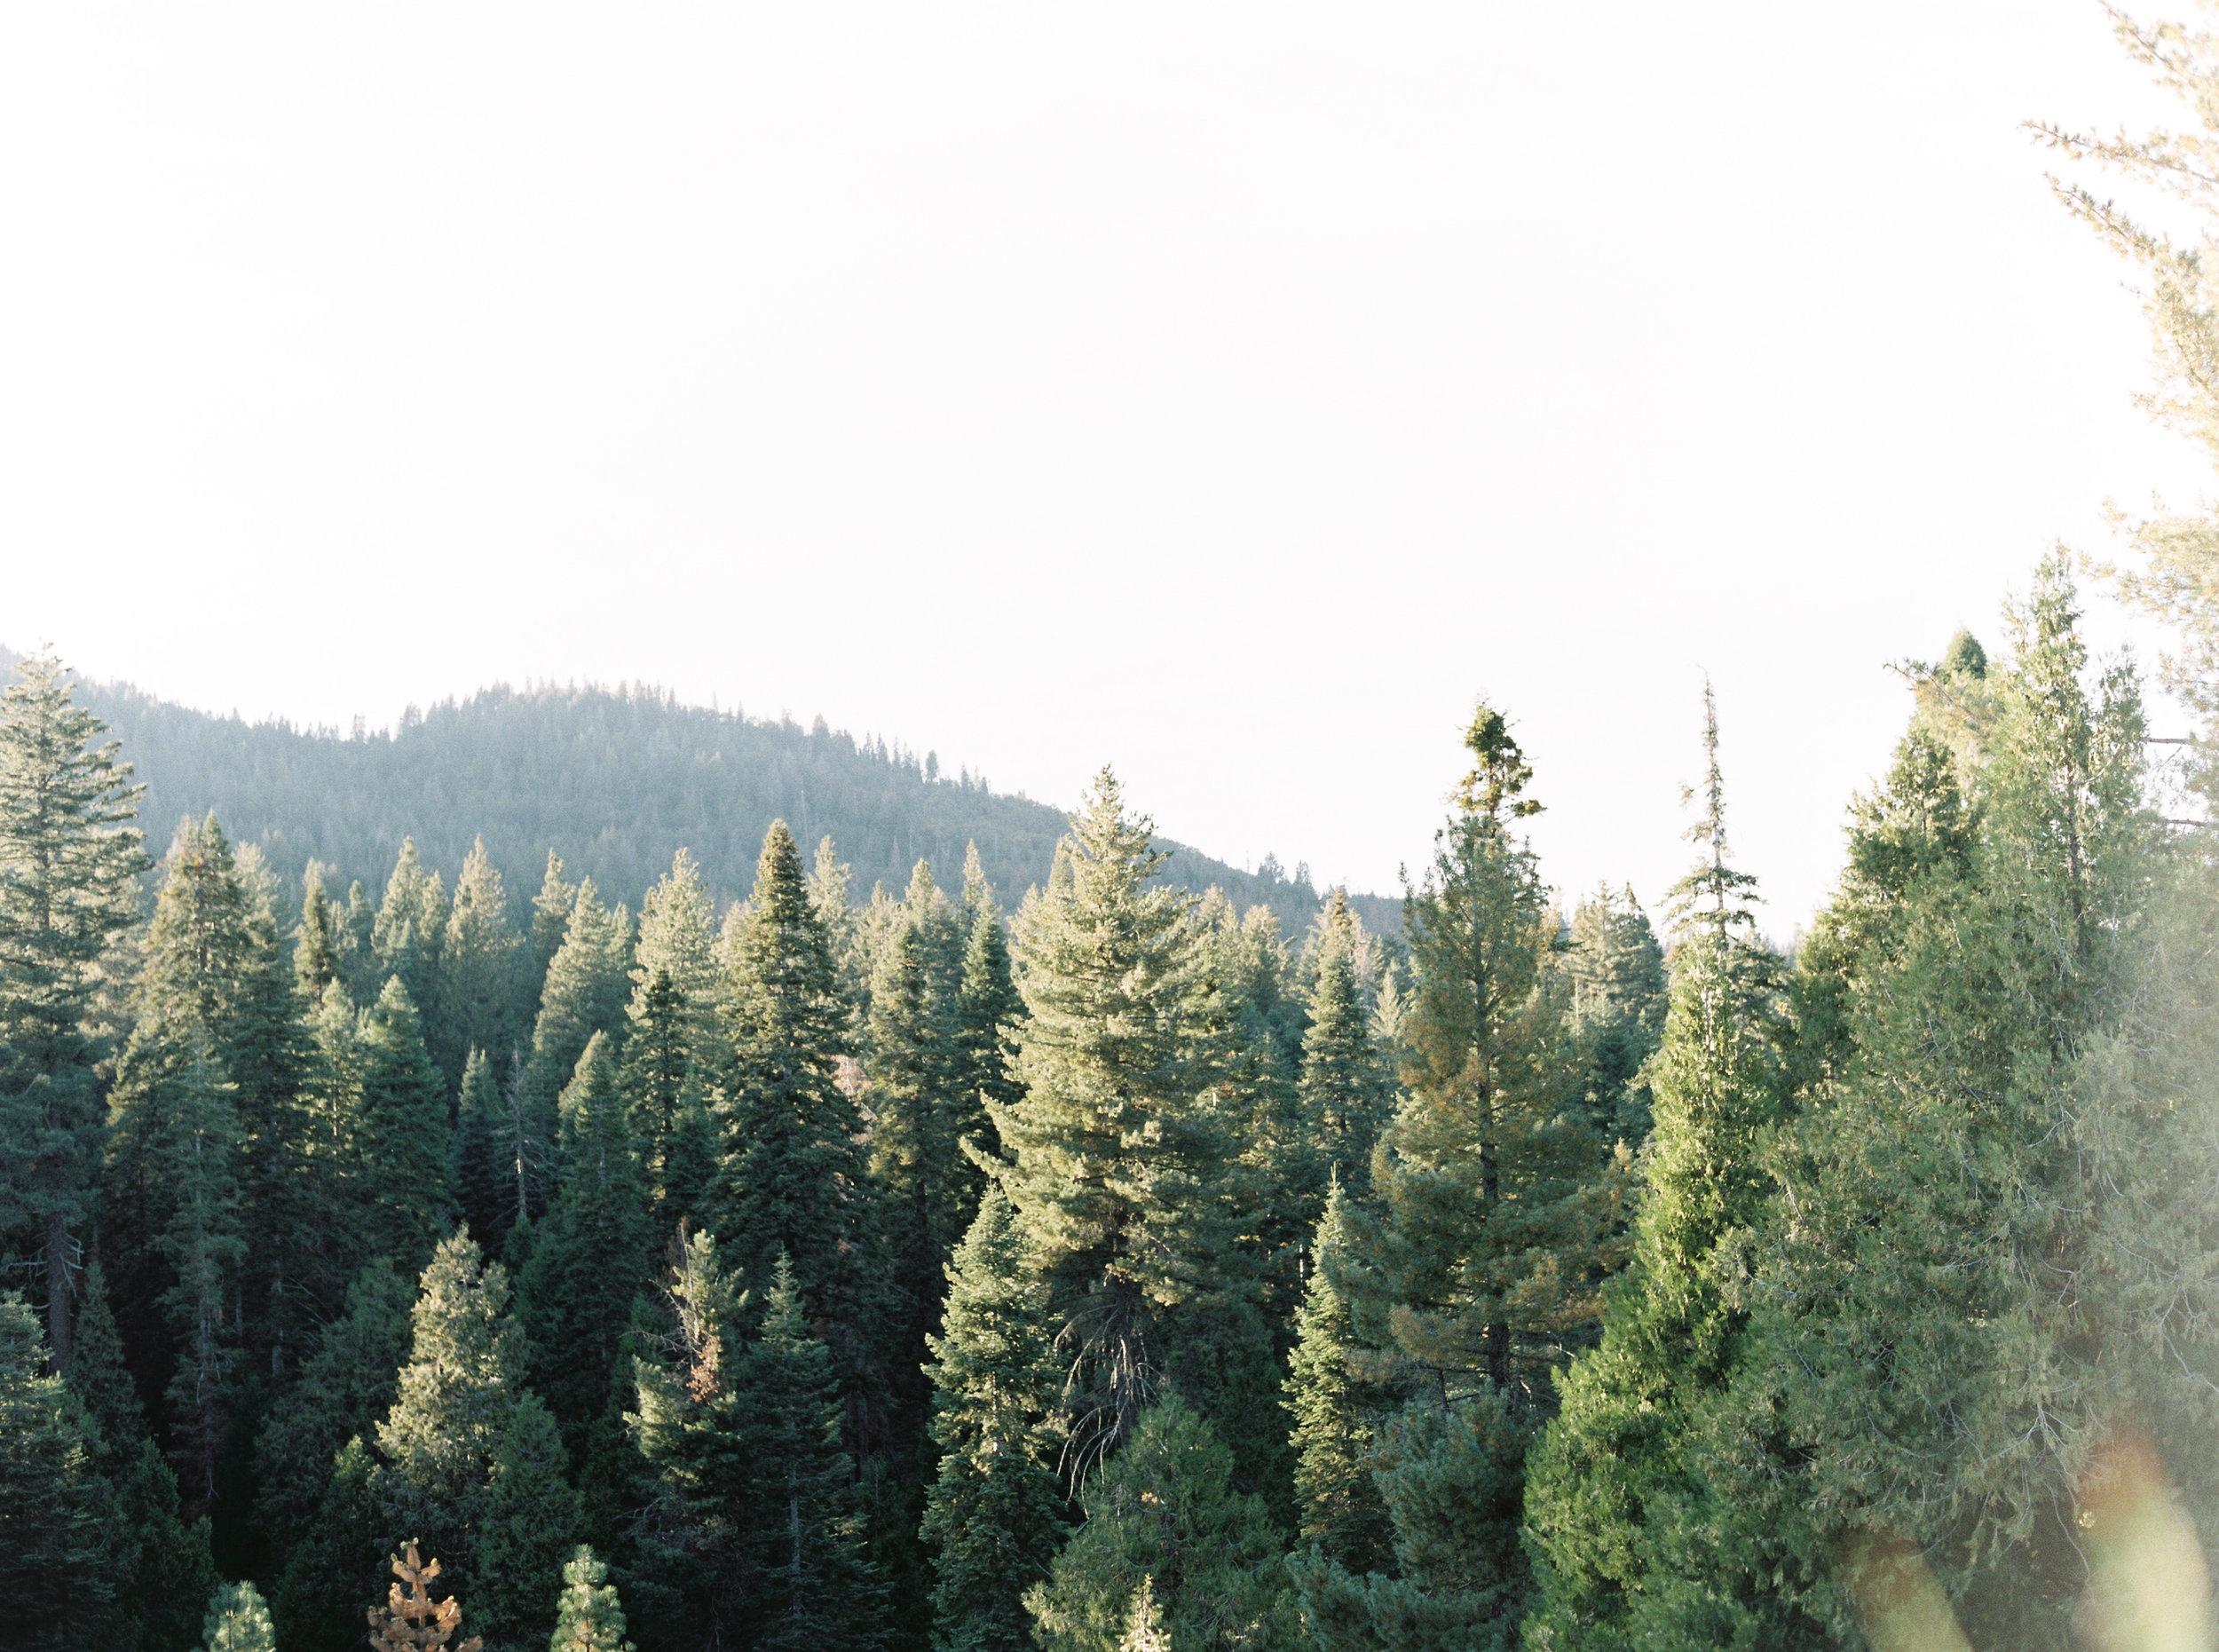 Tenaya-lodge-wedding-at-yosemite-national-park-california-20.jpg